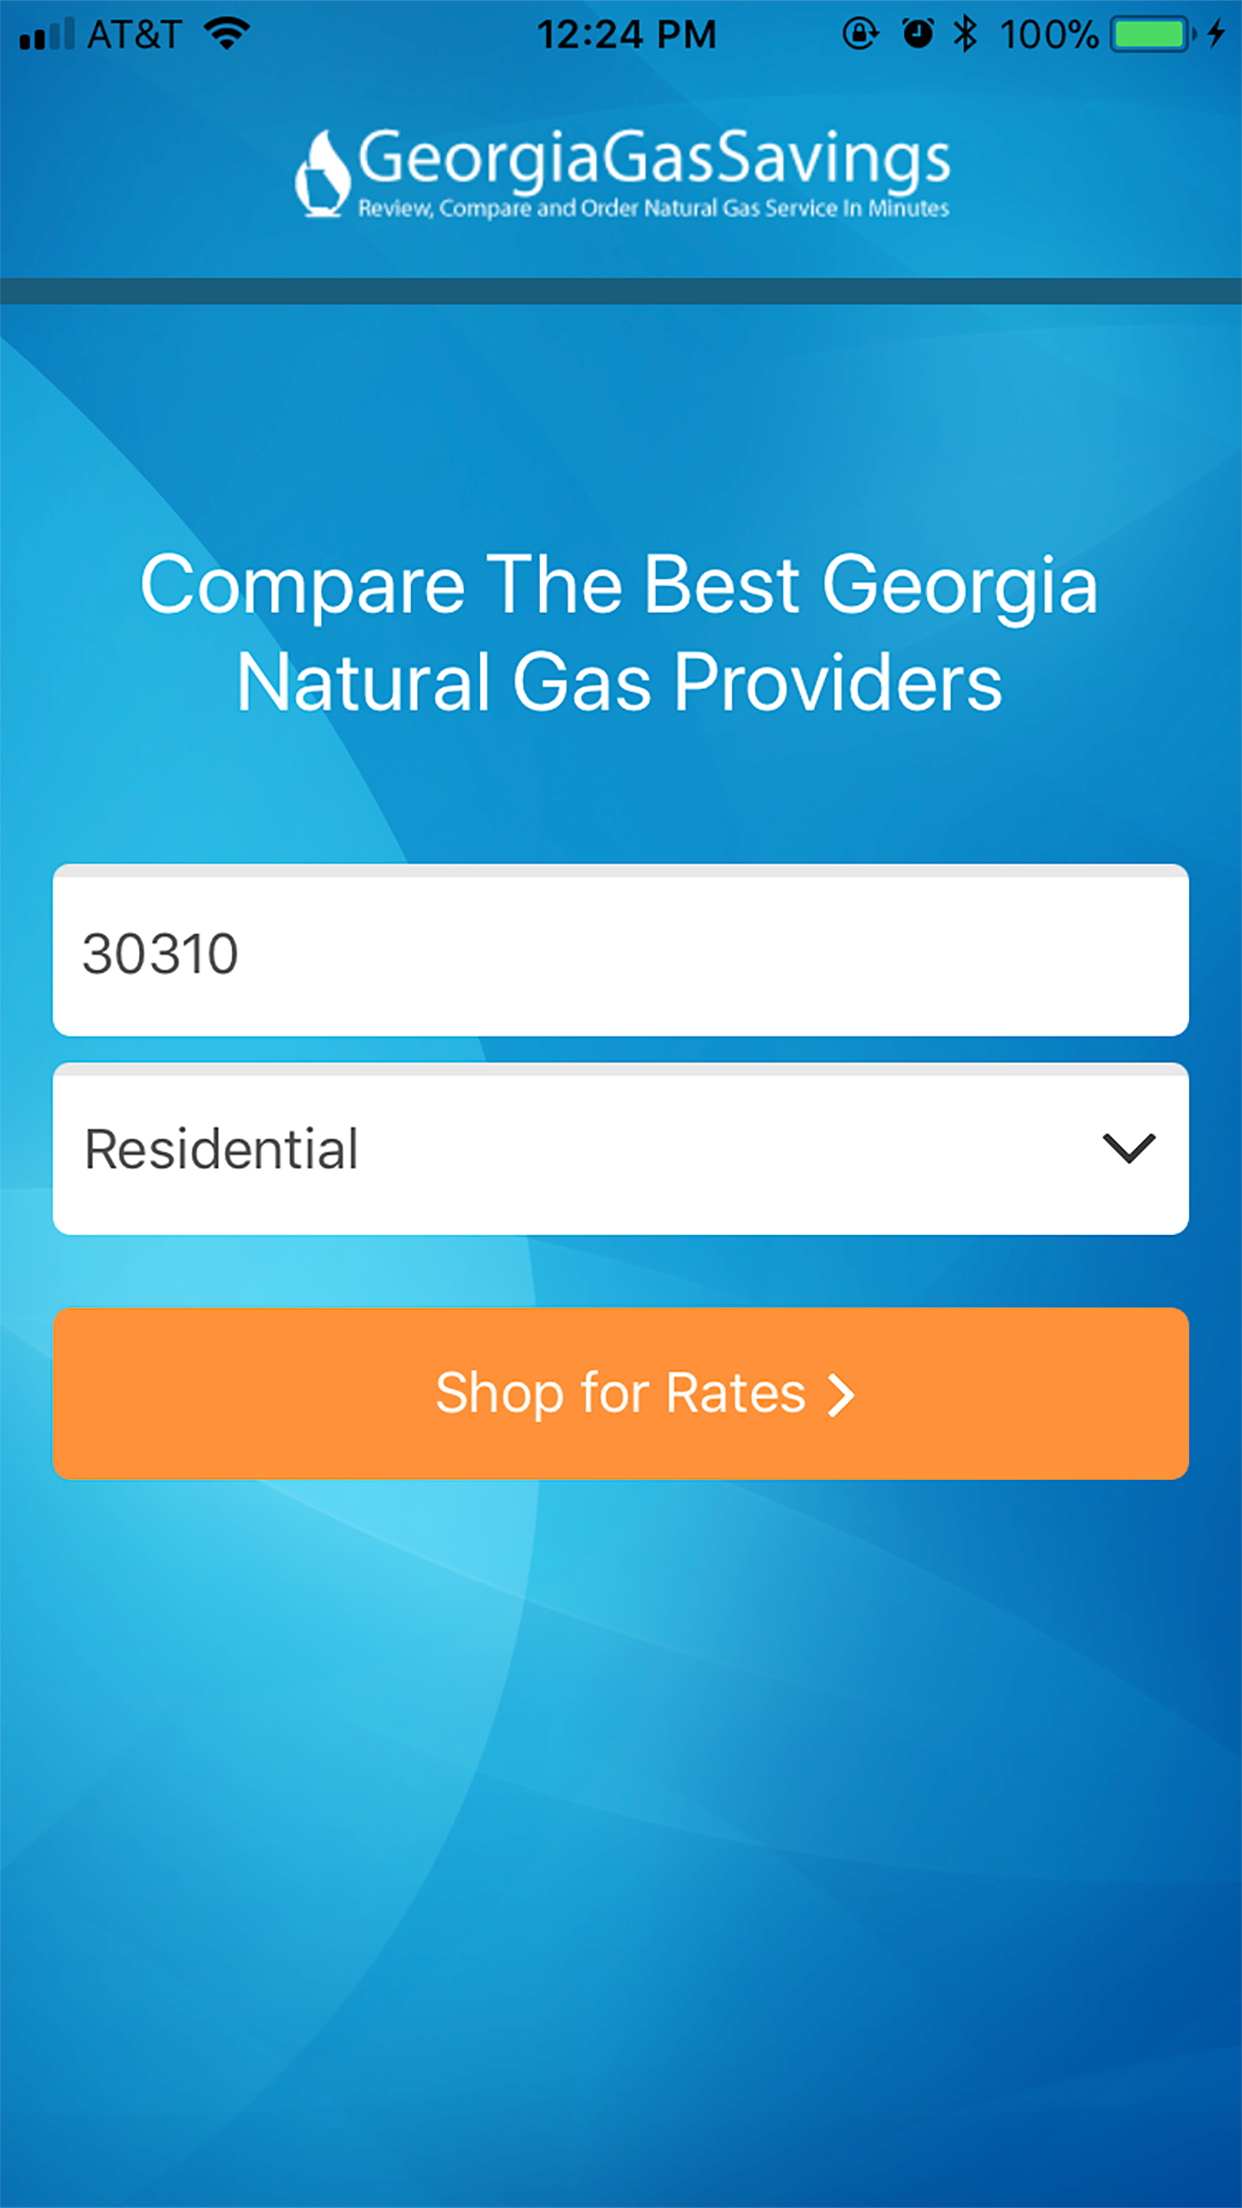 Georgia Gas Savings Launches Georgia Natural Gas Mobile